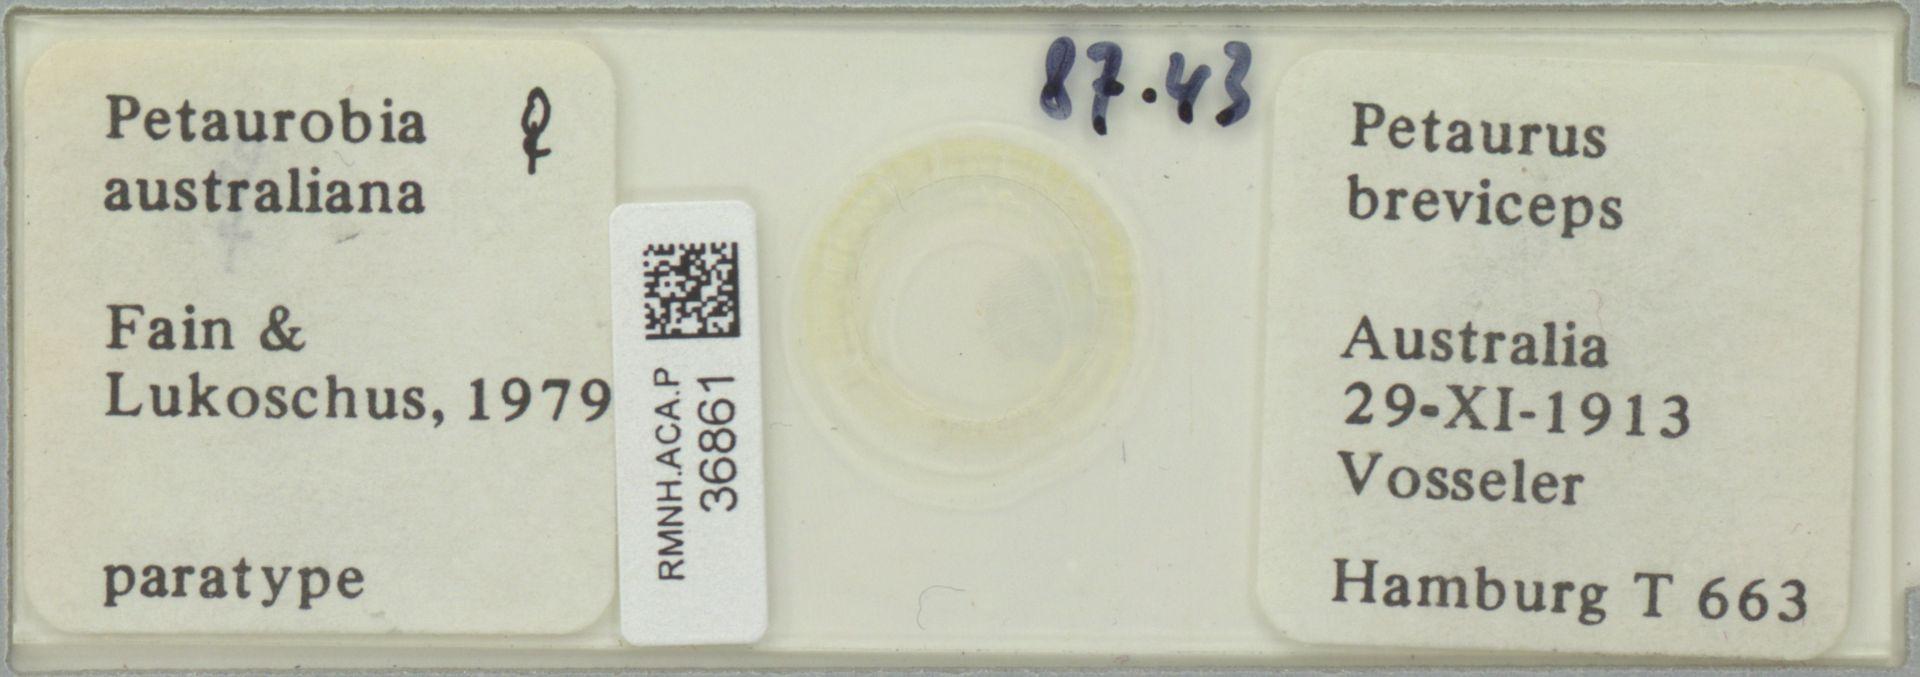 RMNH.ACA.P.36861   Petaurobia australiana Fain & Lukoschus, 1979